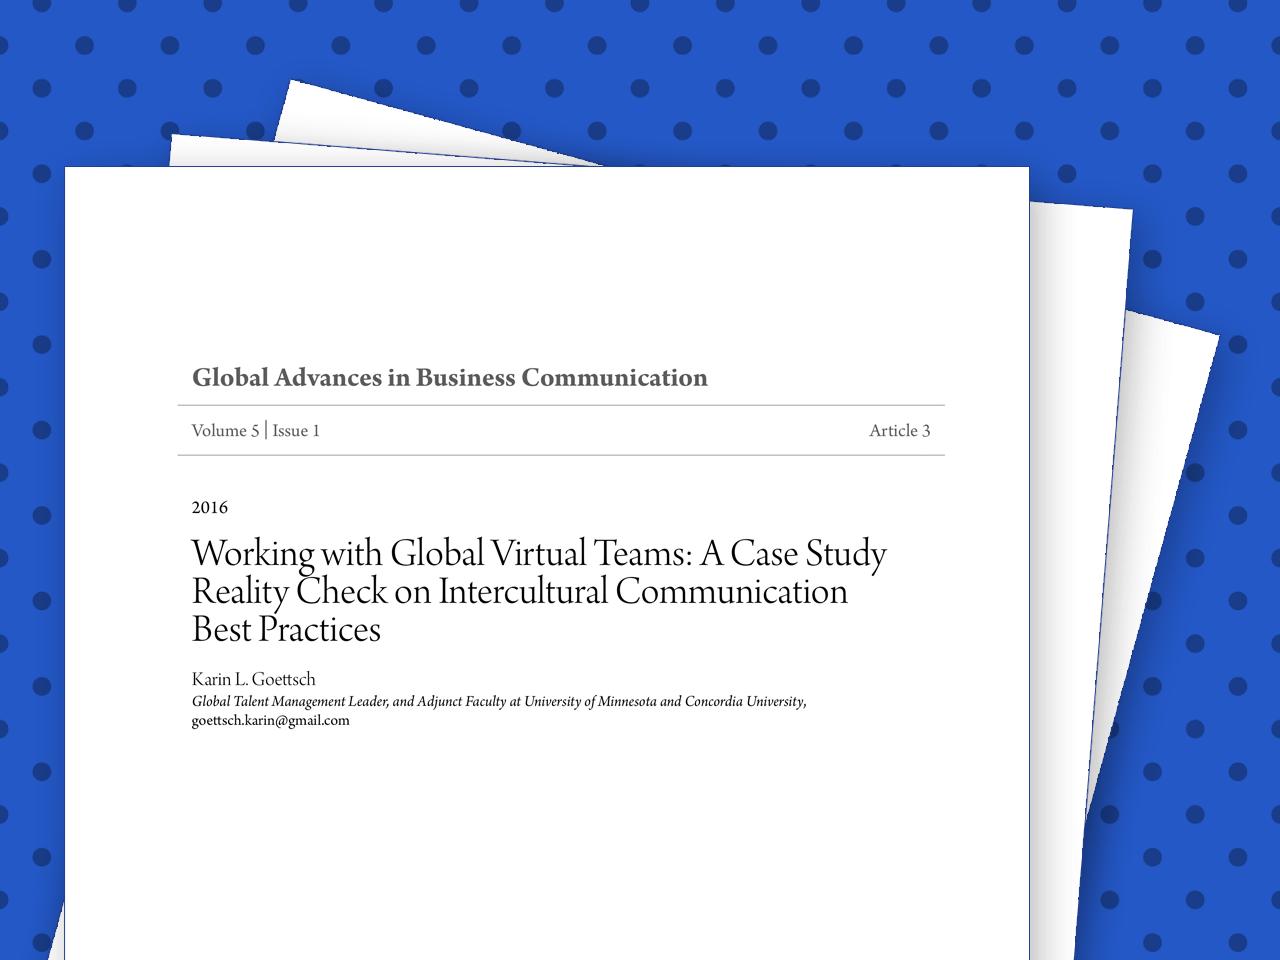 Global Virtual Teams: An Intercultural Communication Reality Check